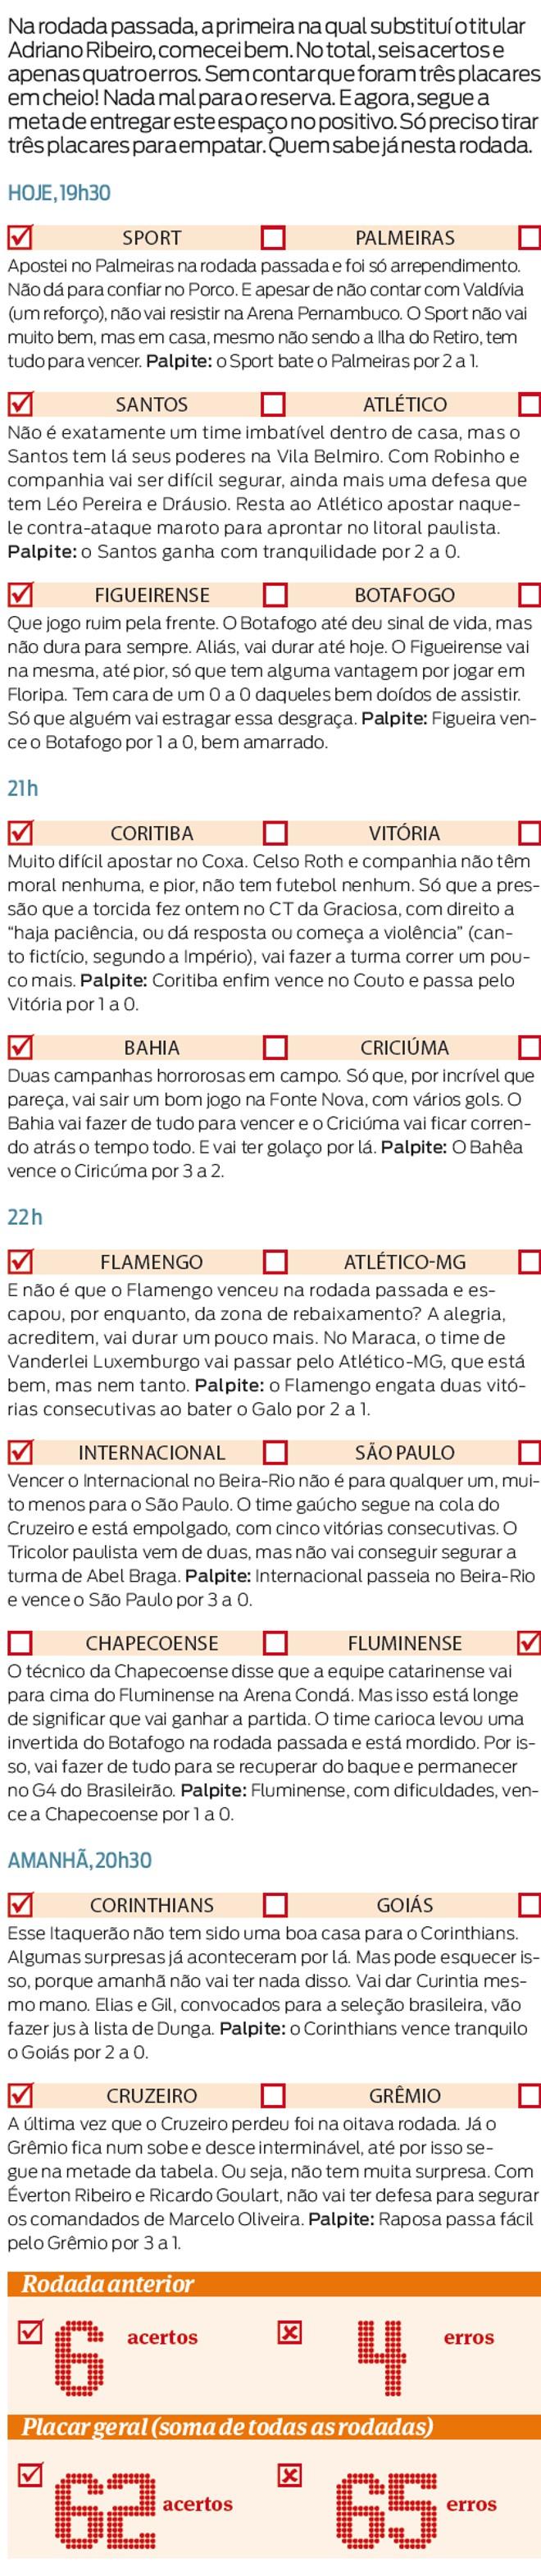 Confira Os Palpites Para Os Jogos Da 16ª Rodada Do Brasileiro